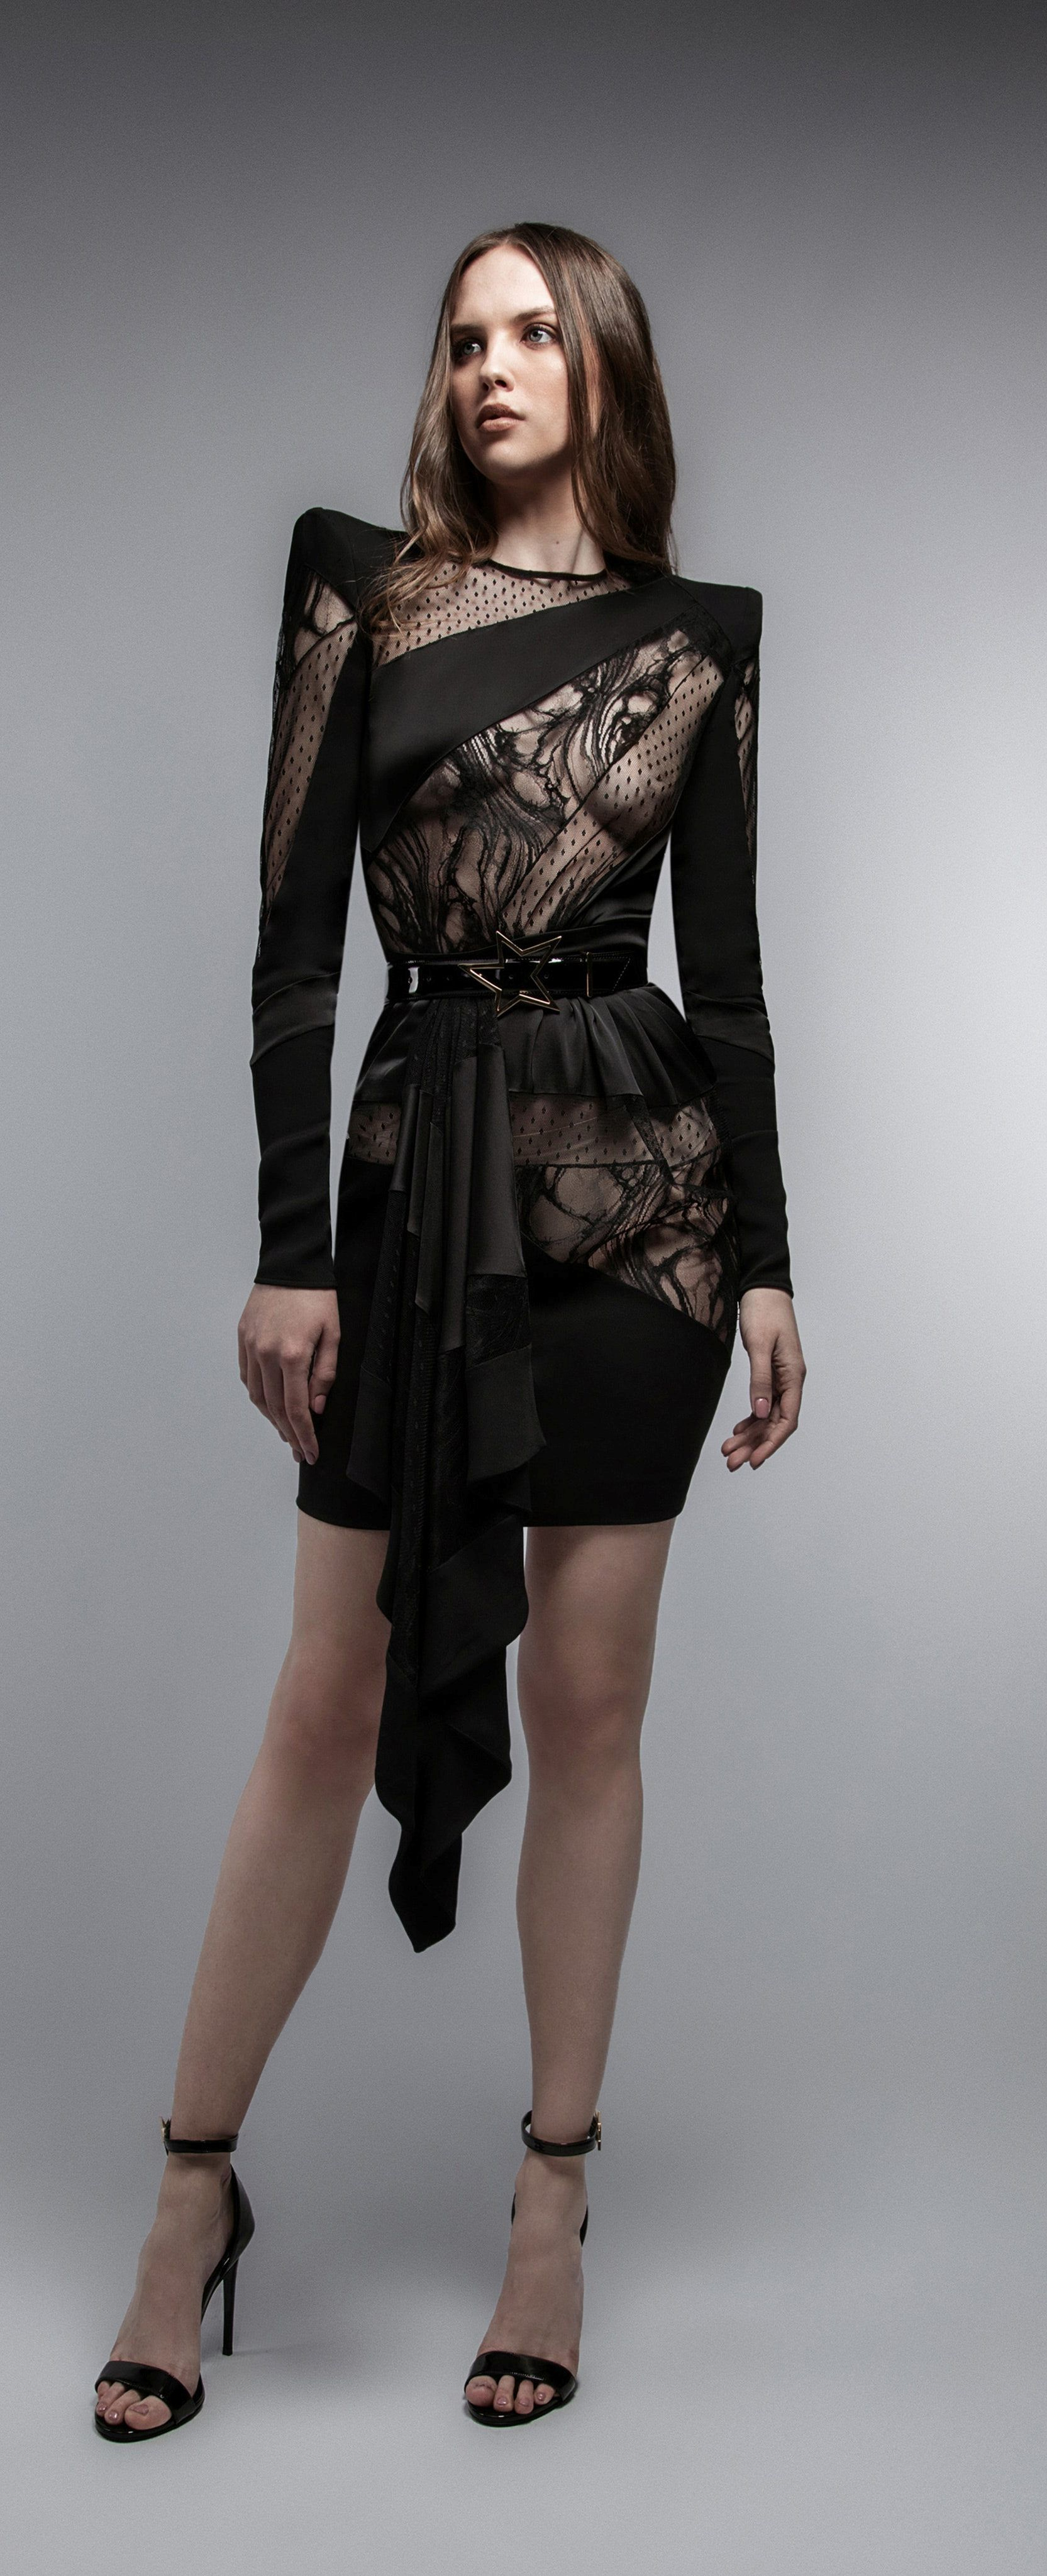 Zuhair Murad Fall 12 RTW in 12   Style inspiration, Fashion ...